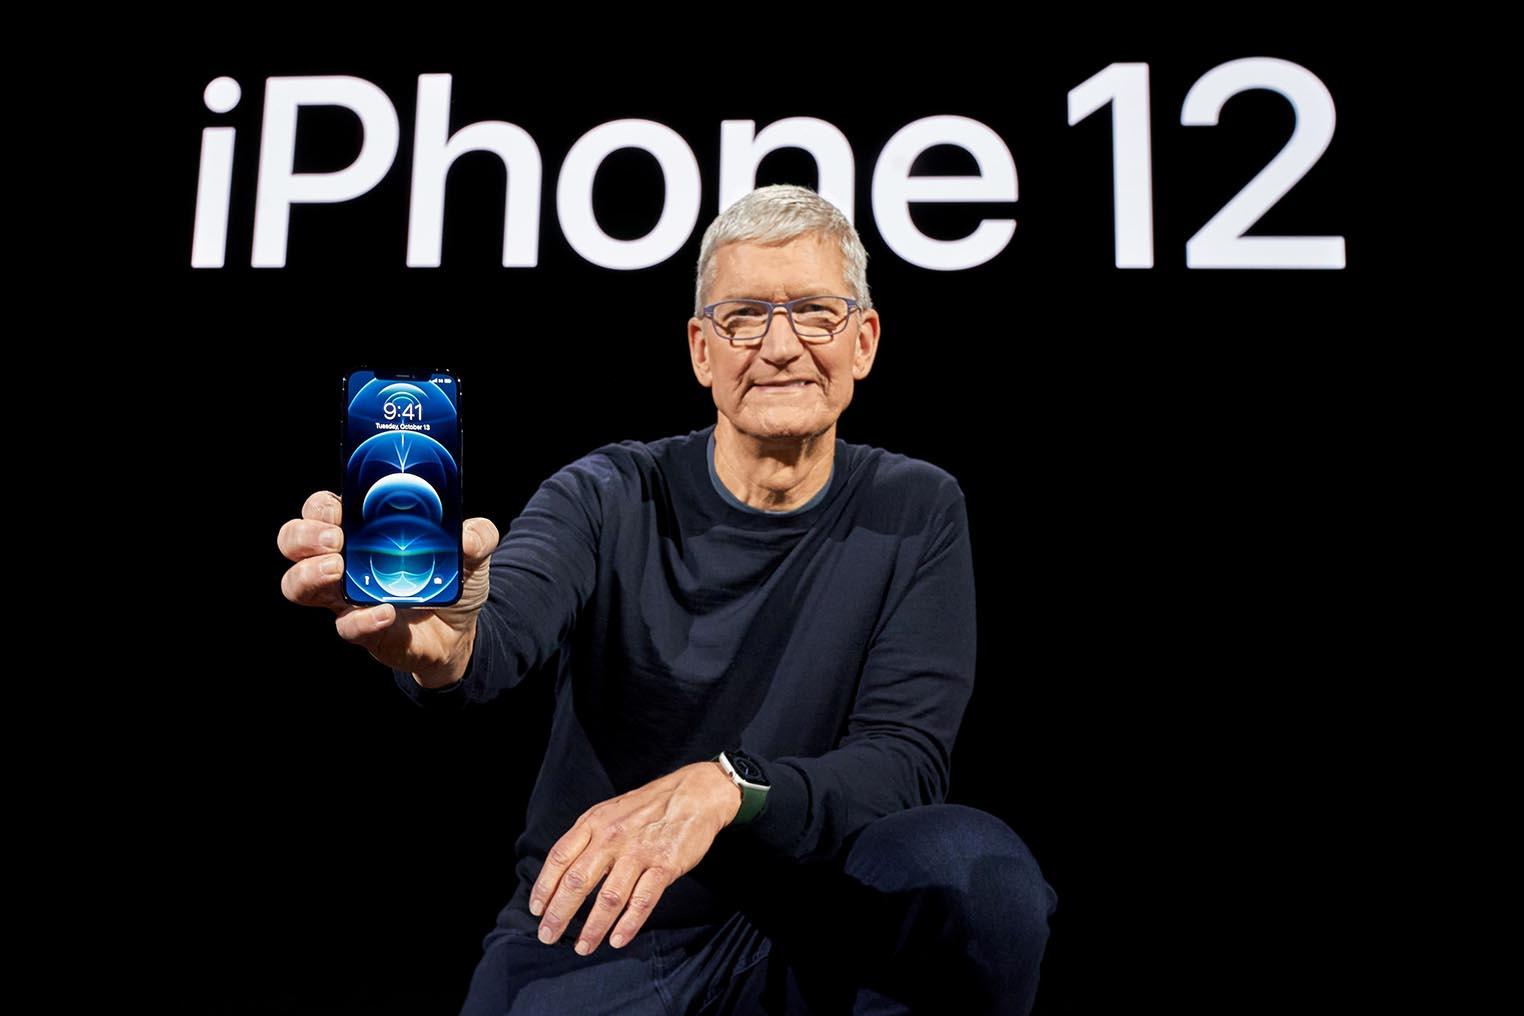 iPhone 12 Tim Cook